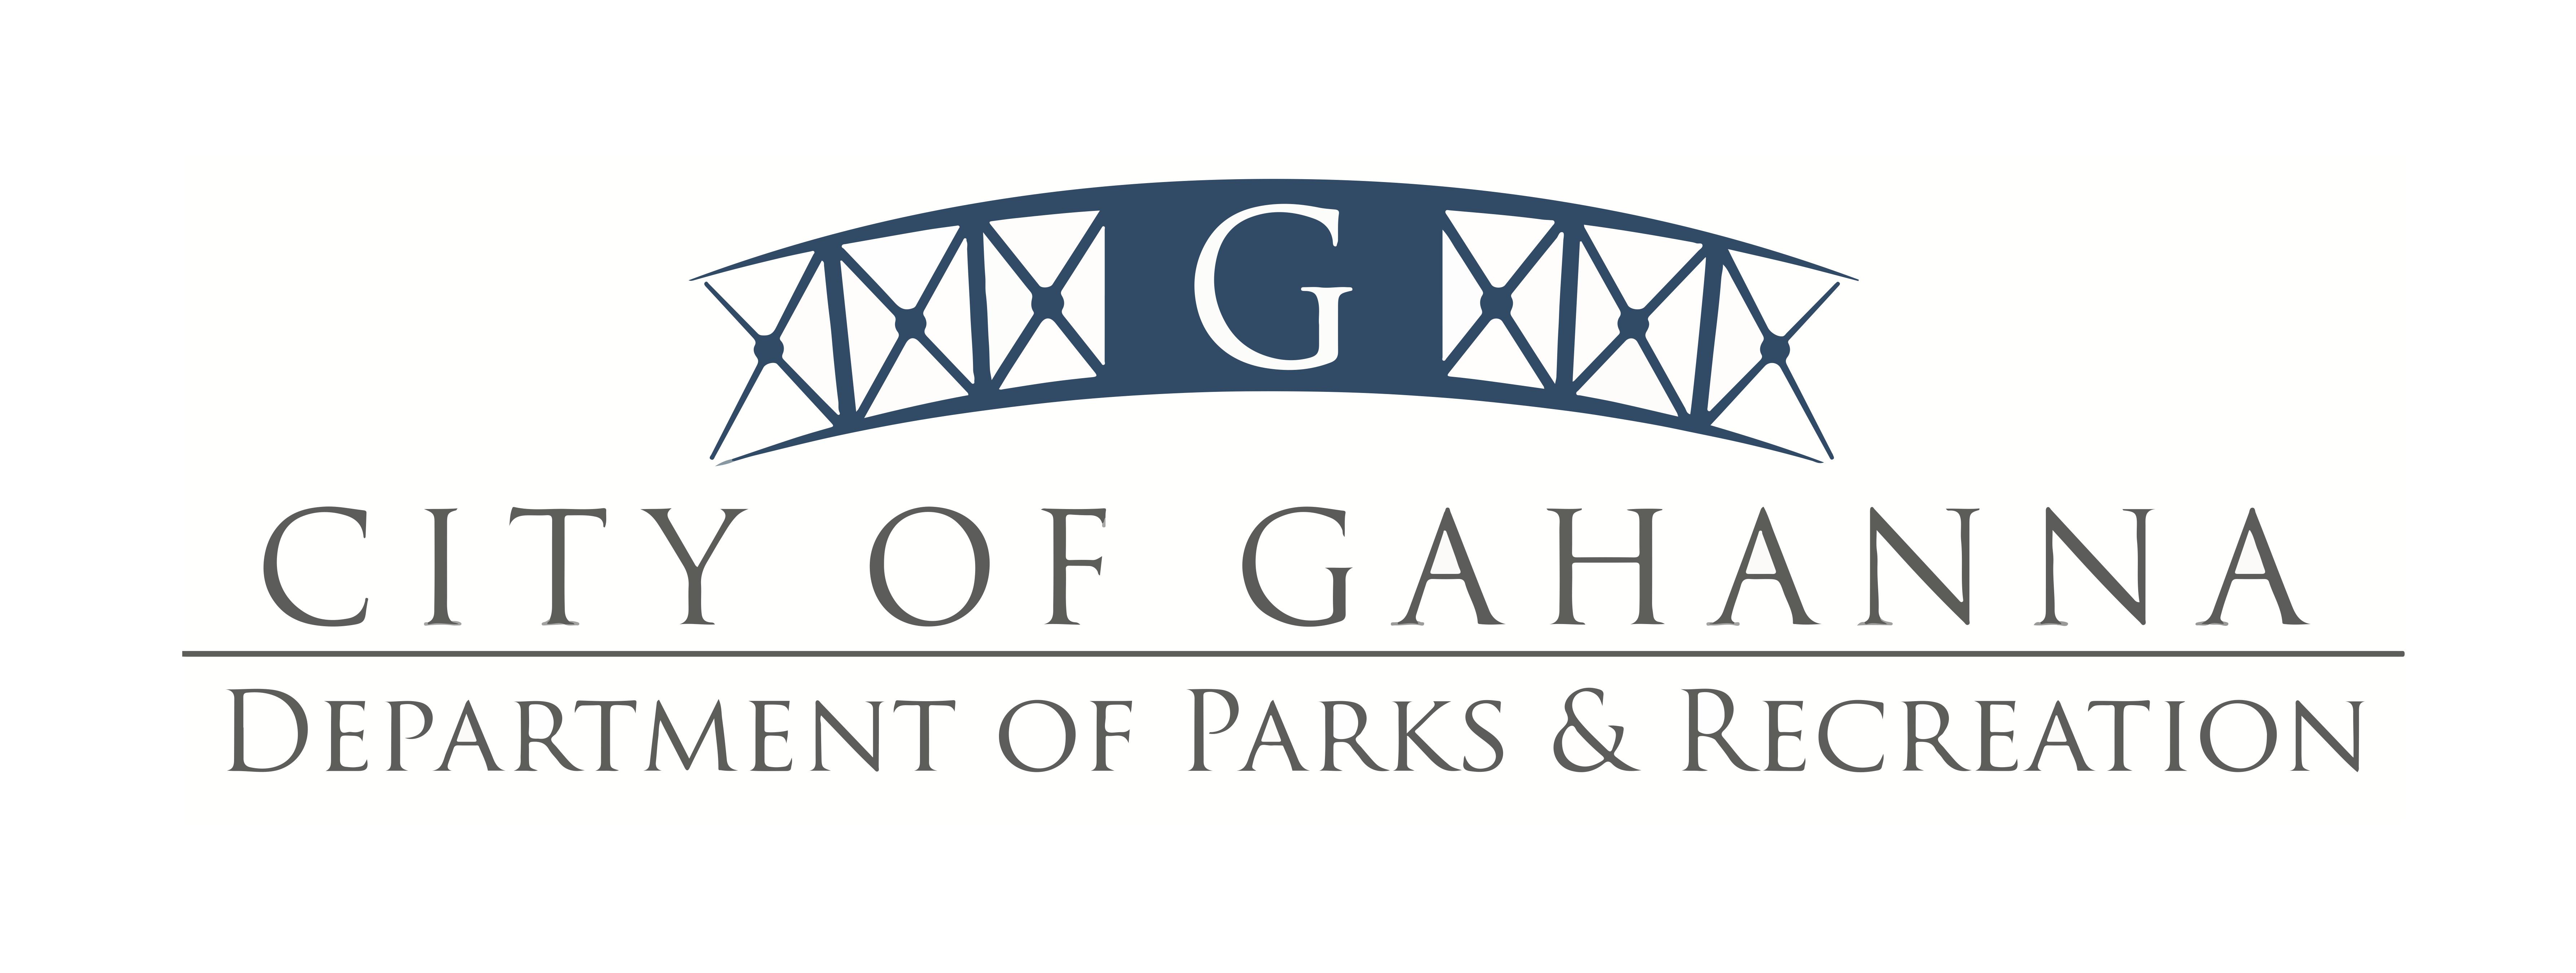 City of Gahanna